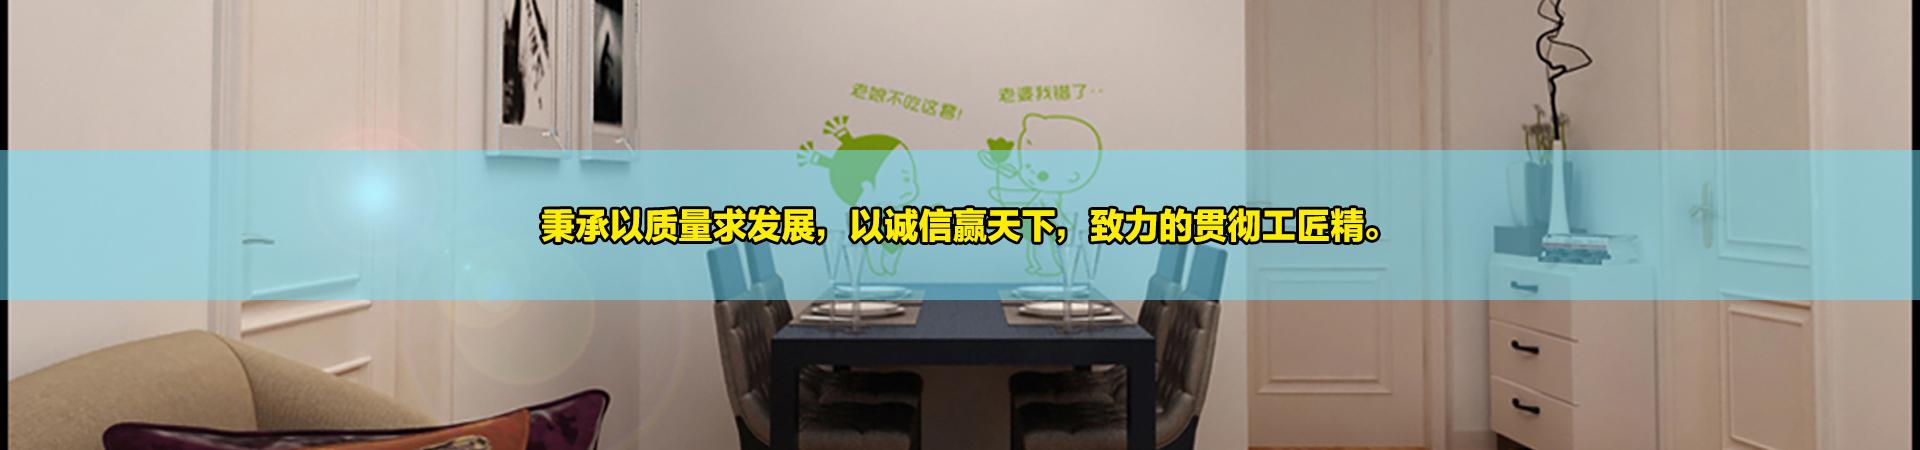 办公室场景banner素材